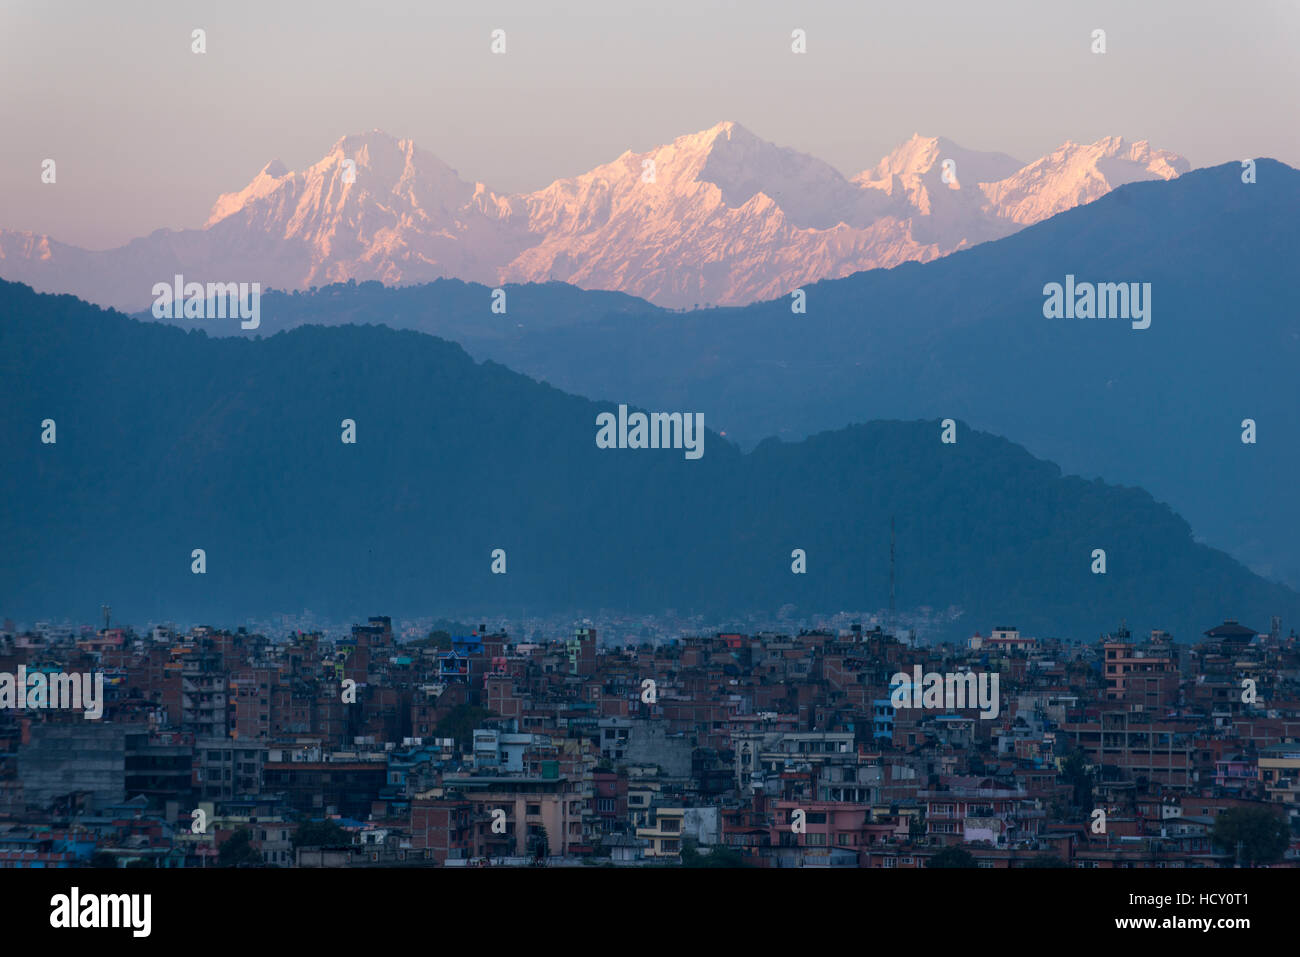 Kathmandu and Ganesh Himal range seen from Sanepa, Nepal - Stock Image